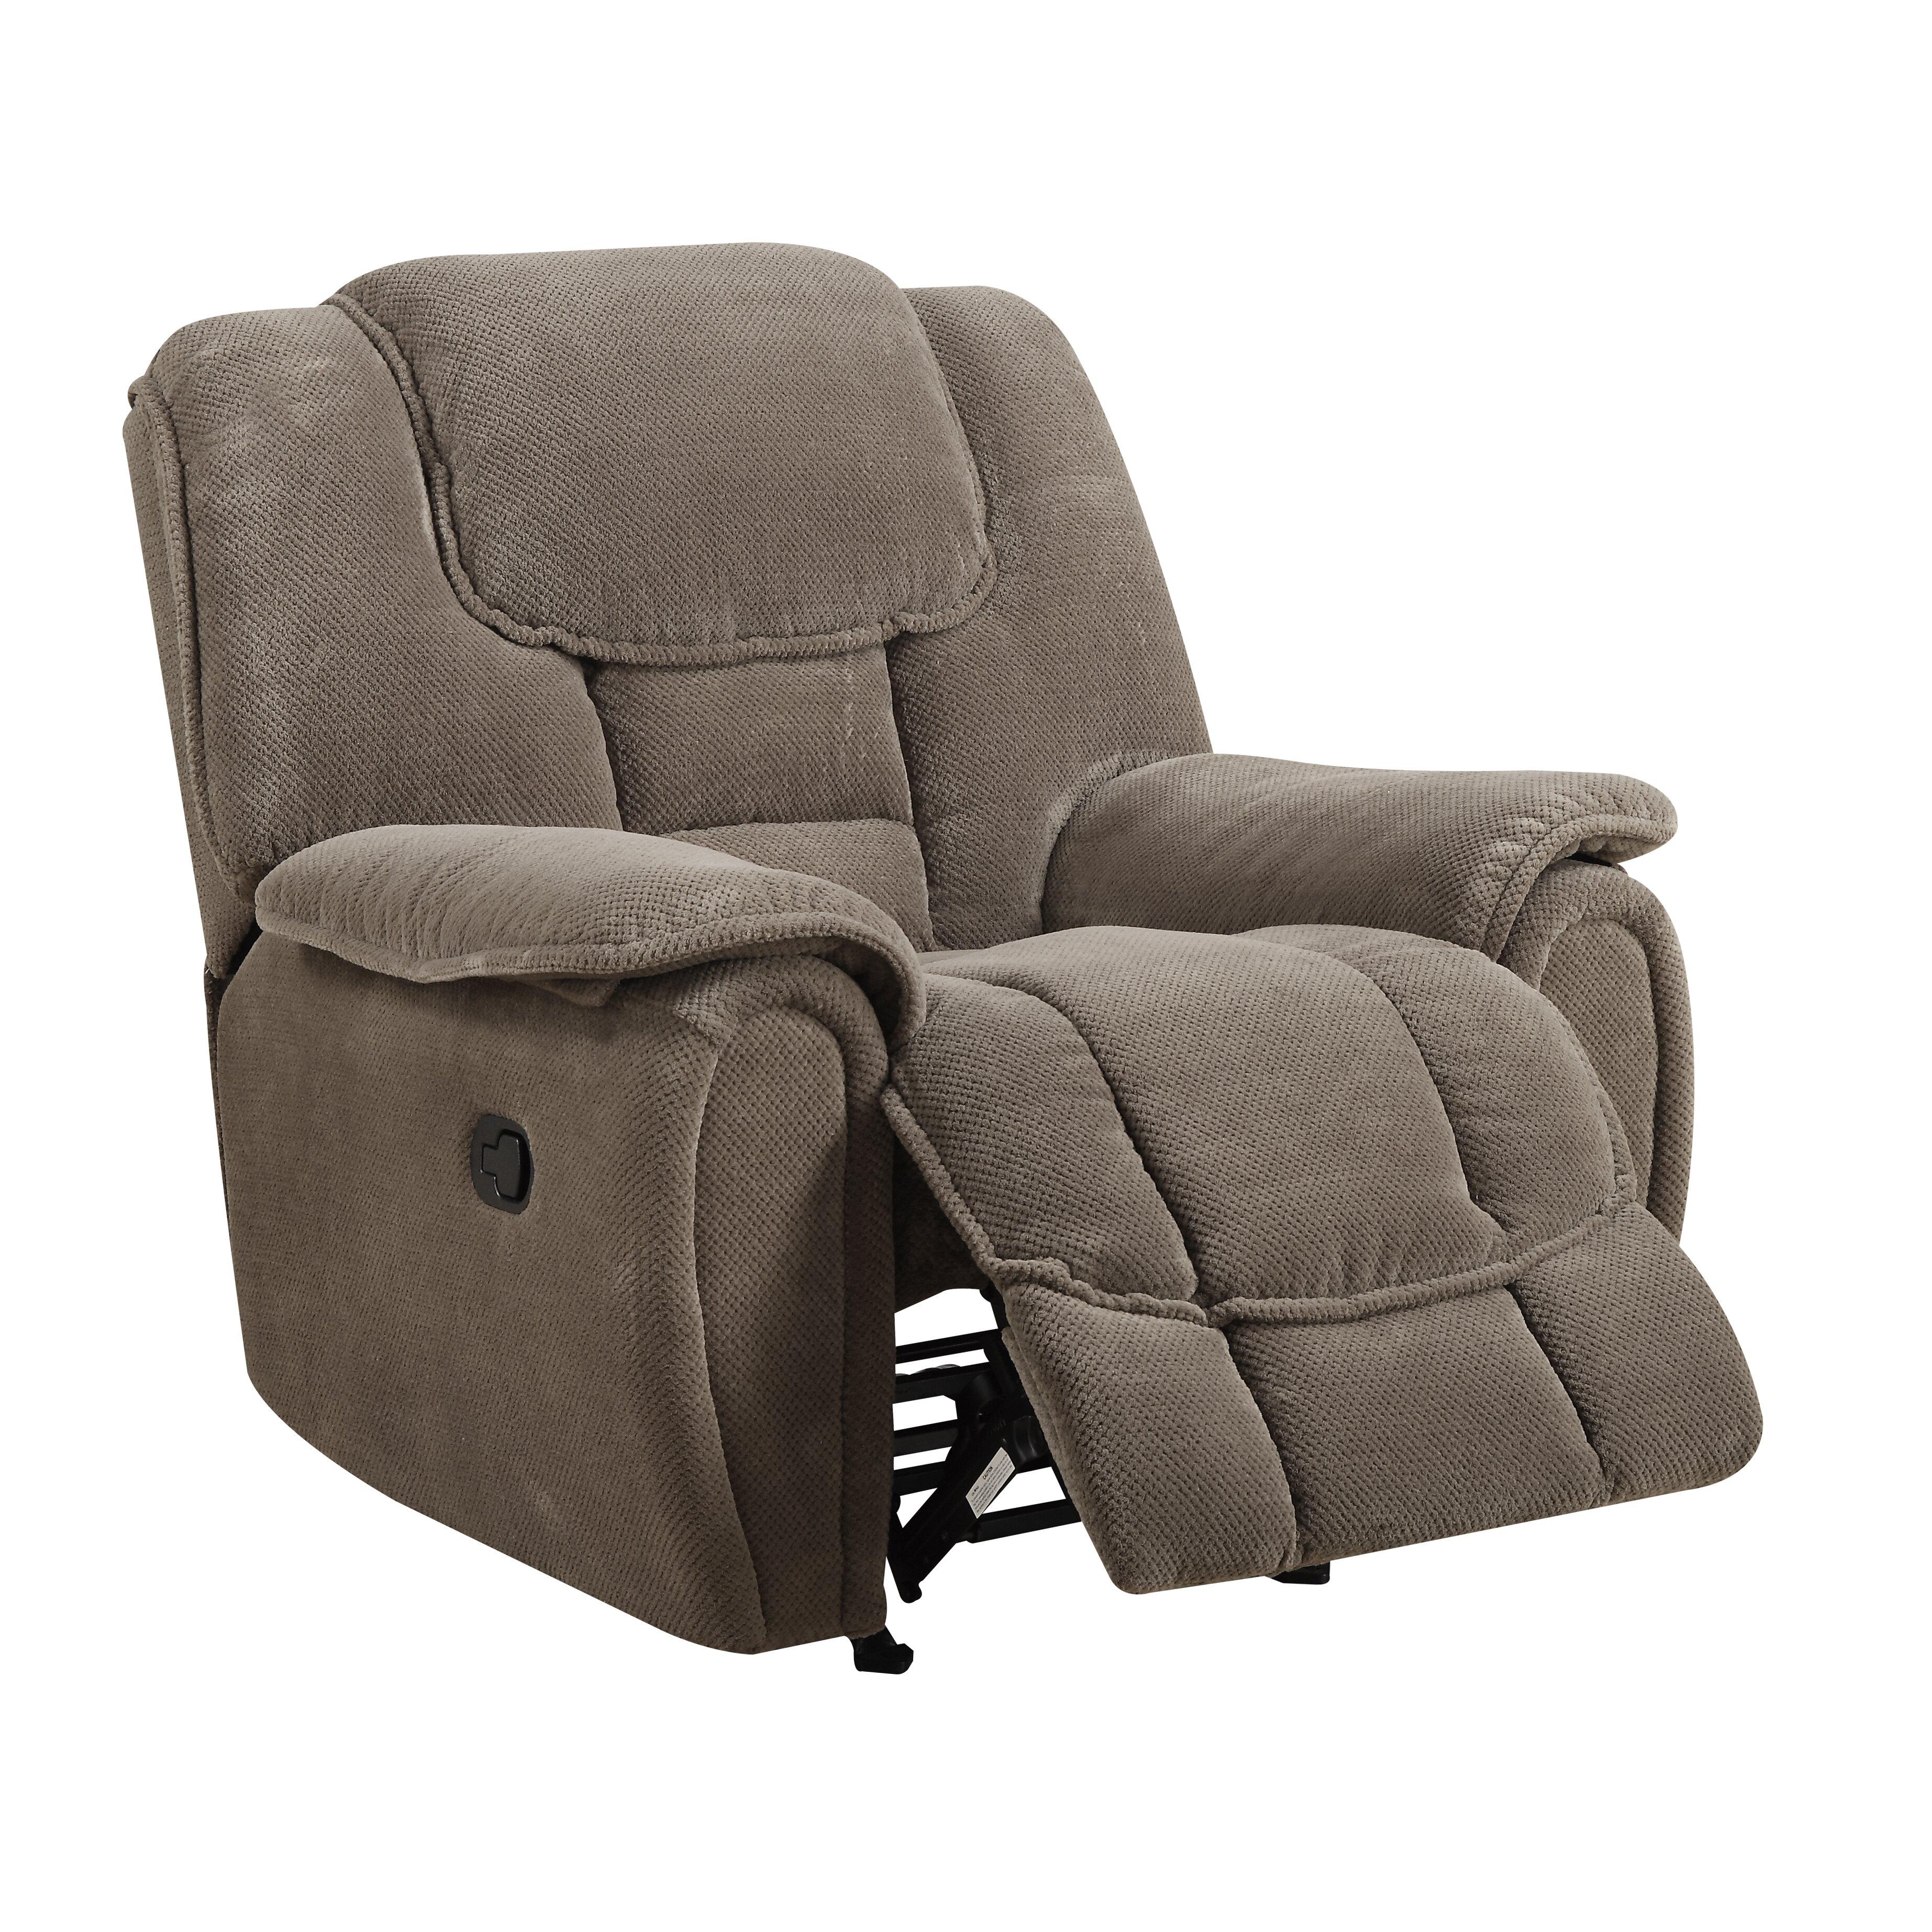 Global furniture usa lisa recliner wayfair for Furniture usa